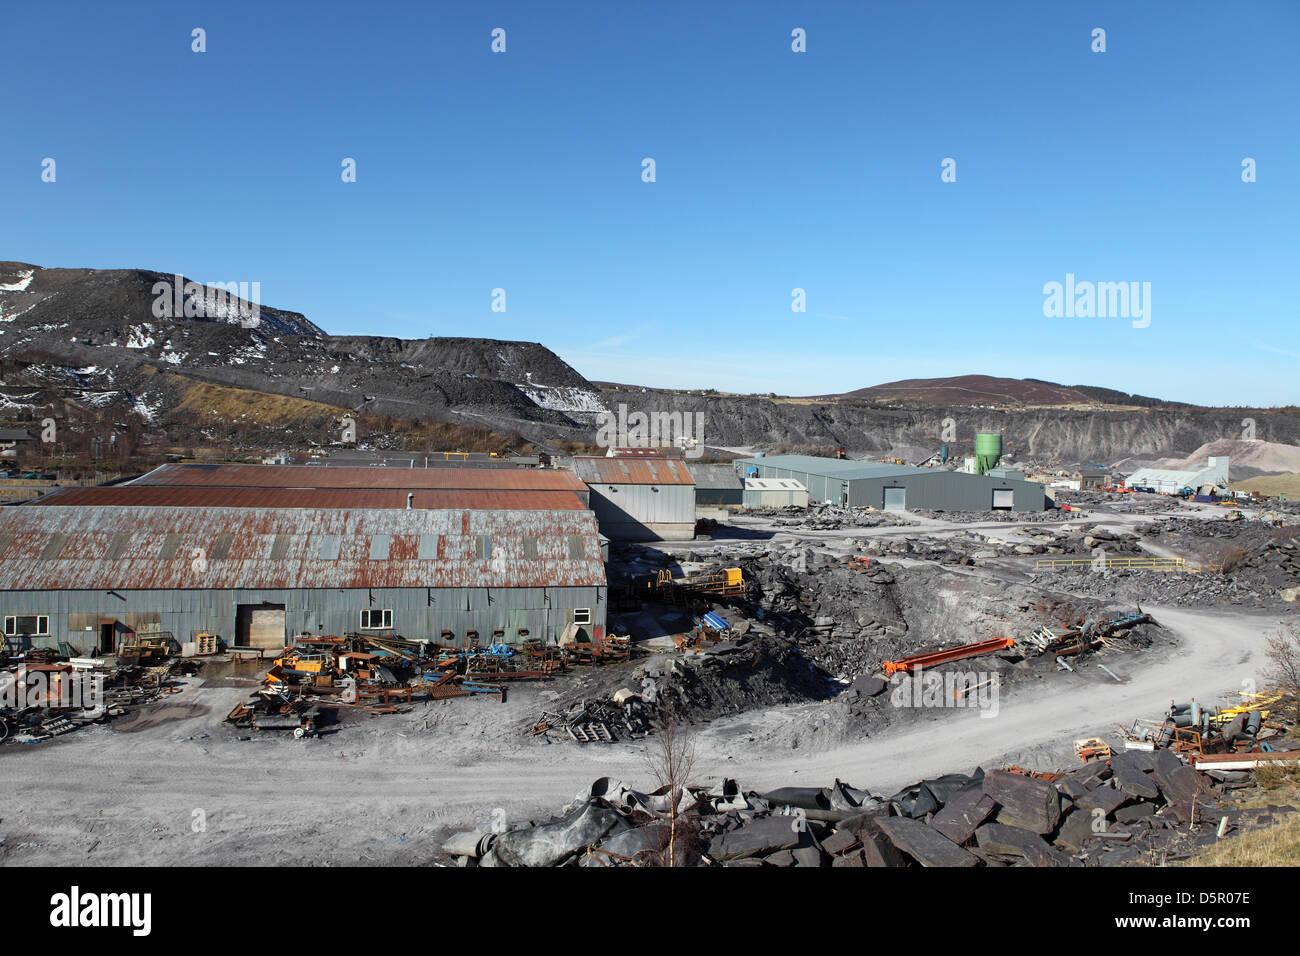 Penrhyn Quarry Stock Photos & Penrhyn Quarry Stock Images - Alamy